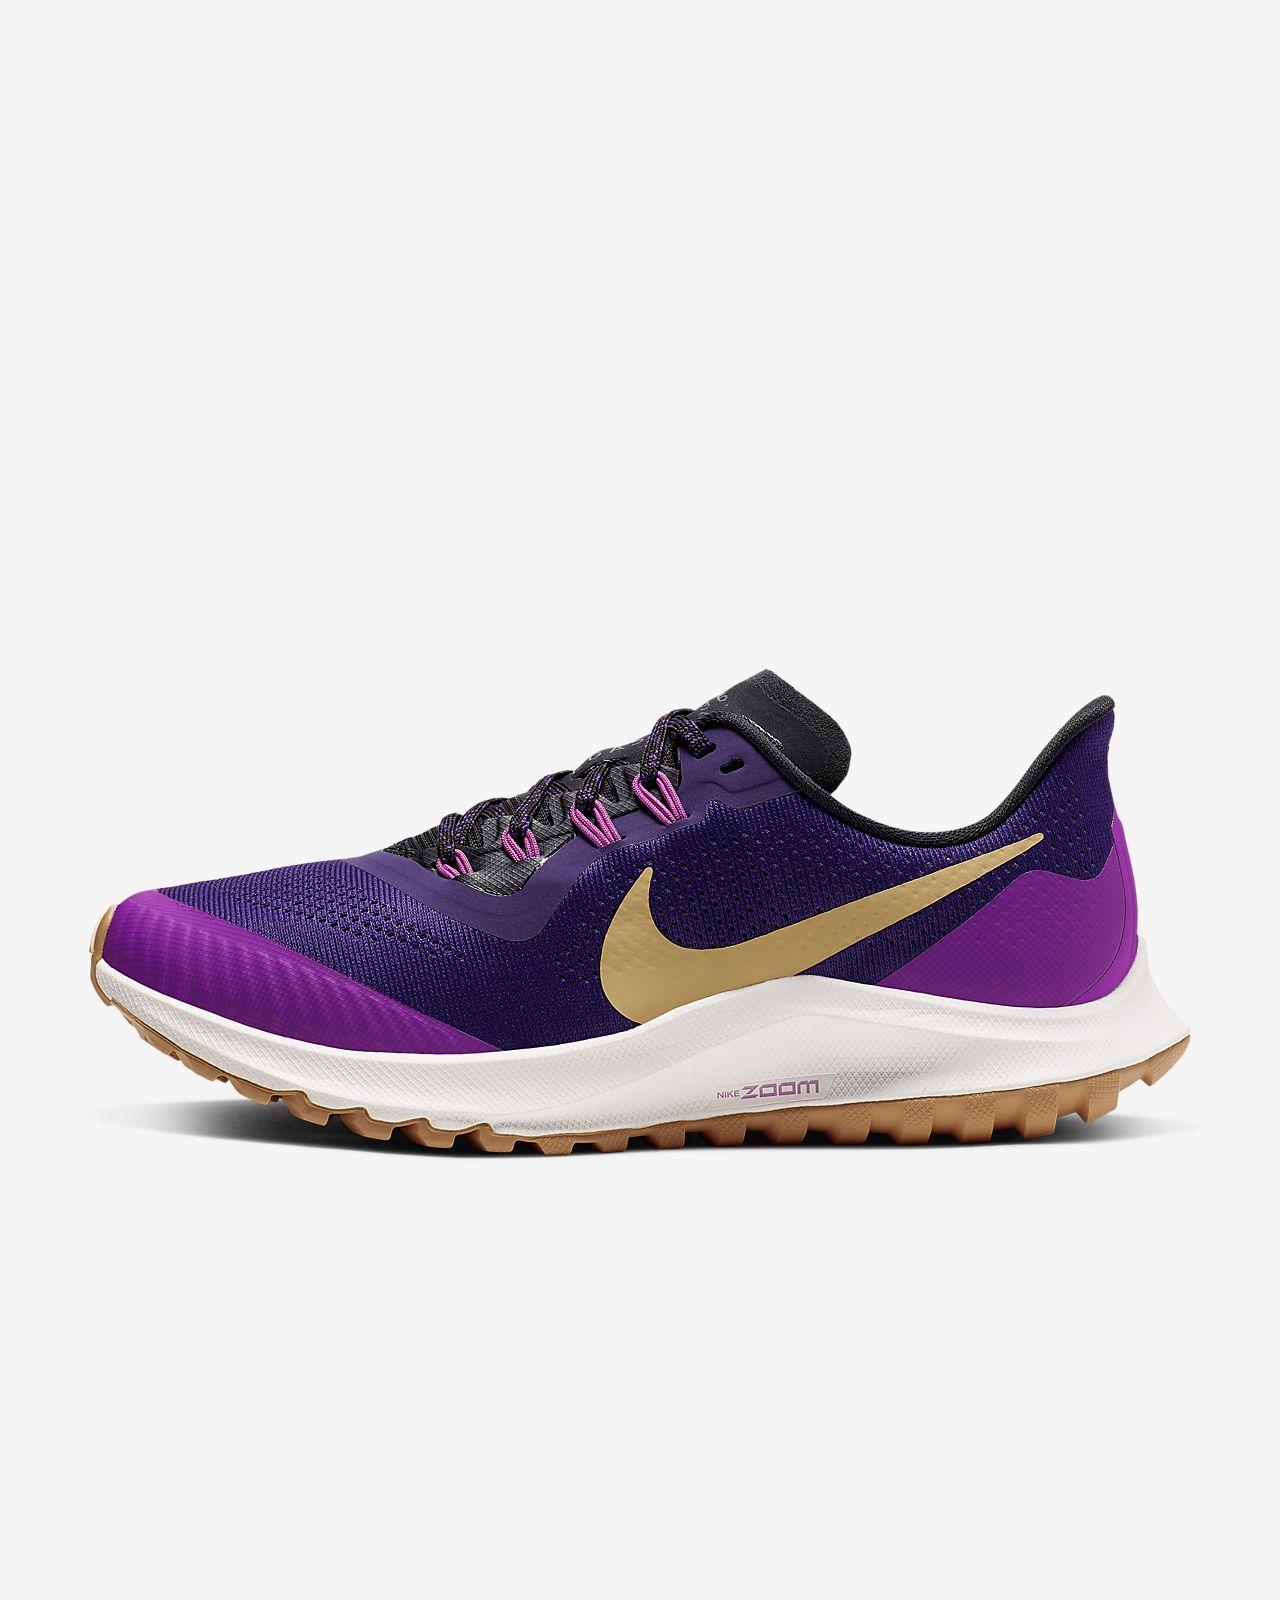 3d03e731 Nike Air Zoom Pegasus 36 Trail-løbesko til kvinder. Nike.com DK